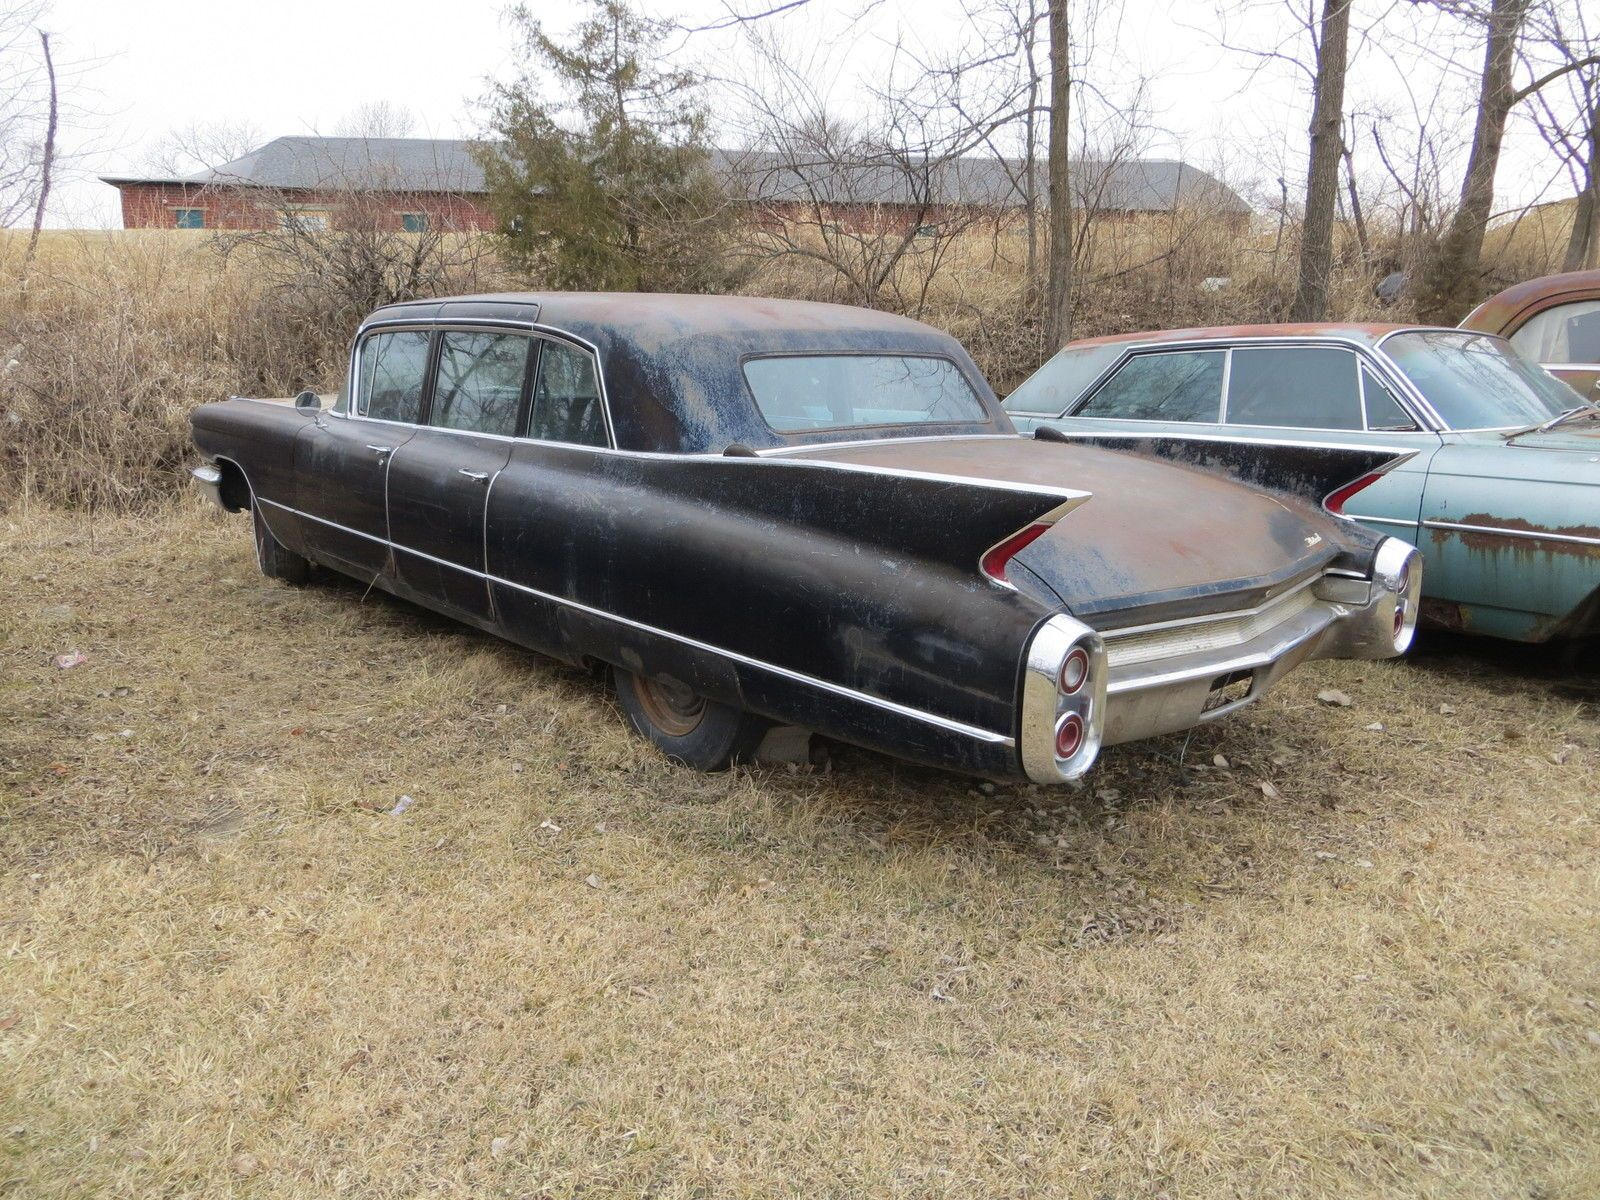 1960 Cadillac Limousine | Limos / Airport Shuttles | Pinterest ...